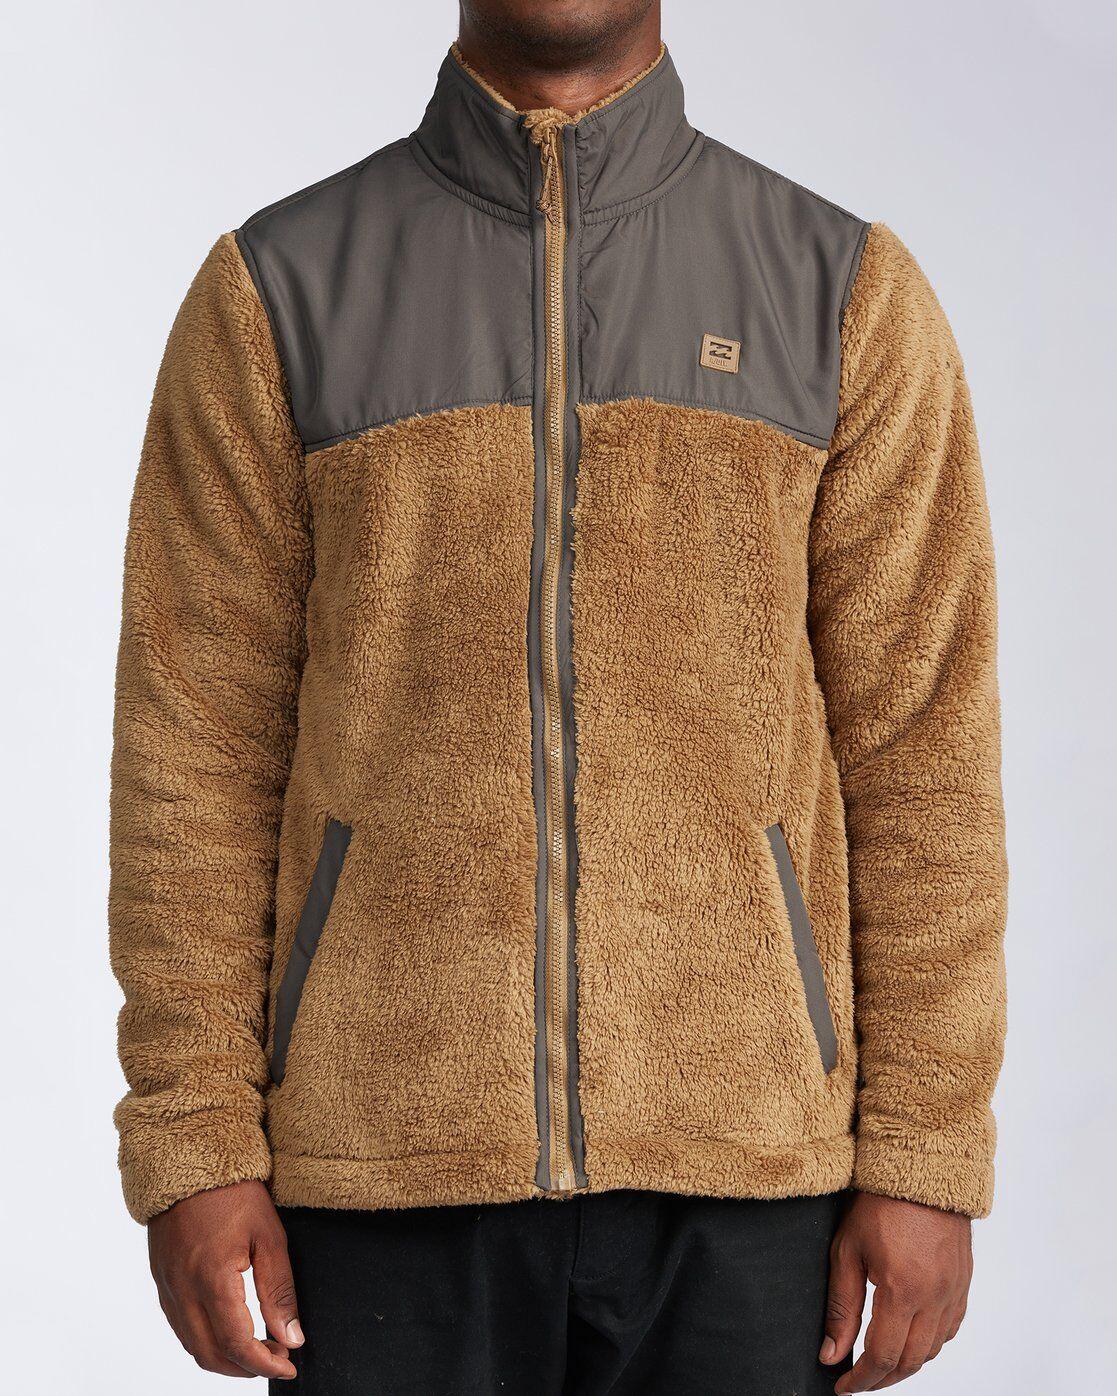 Billabong Flint Zip Jacket  - Brown - Size: Extra Large